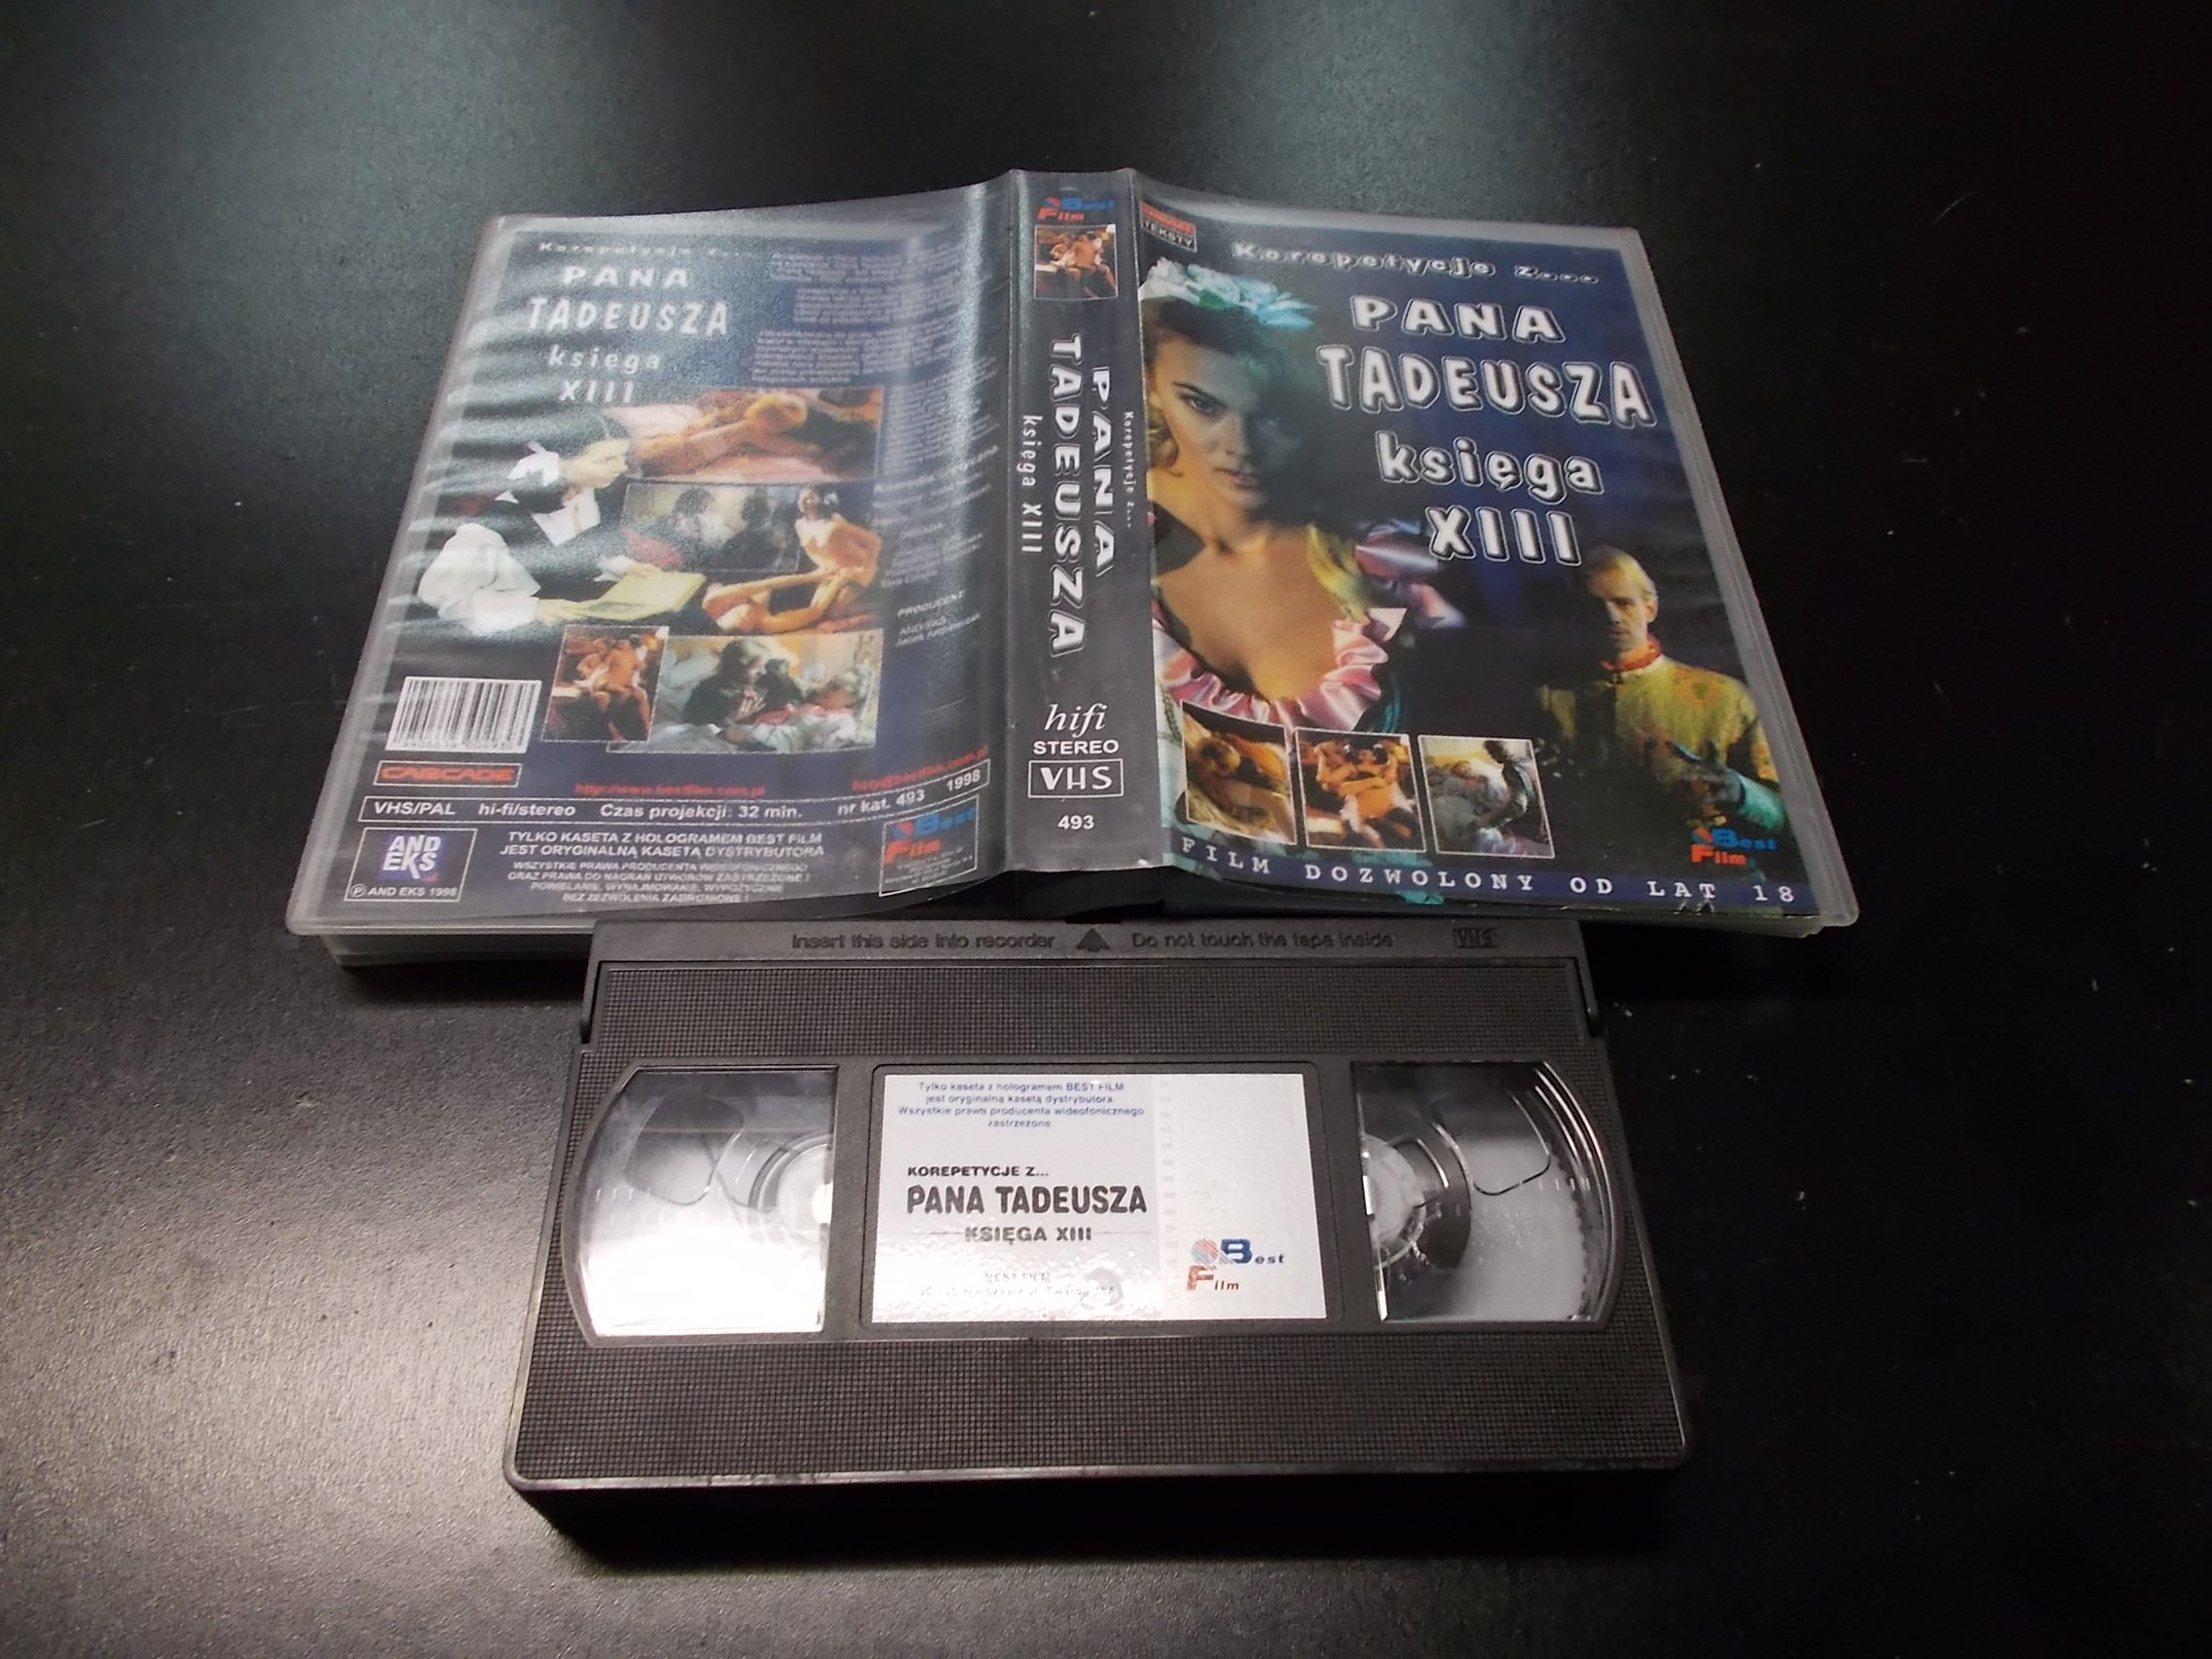 KOREPETYCJE Z... PANA TADEUSZA KSIĘGA 13 -  kaseta VHS - 1206 Opole - AlleOpole.pl